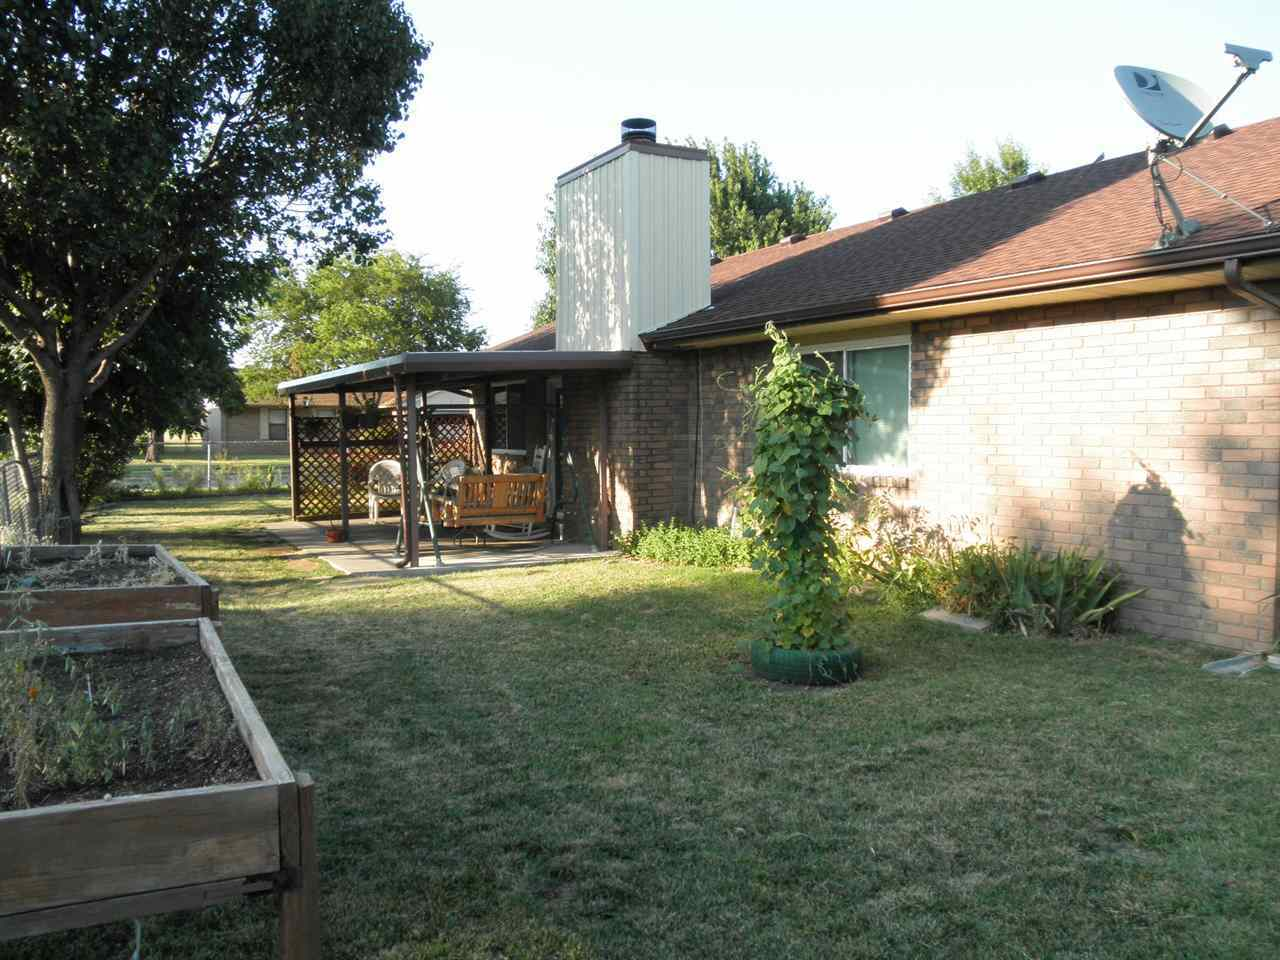 Sold Intraoffice W/MLS | 2520 Bonnie Ponca City, OK 74601 14